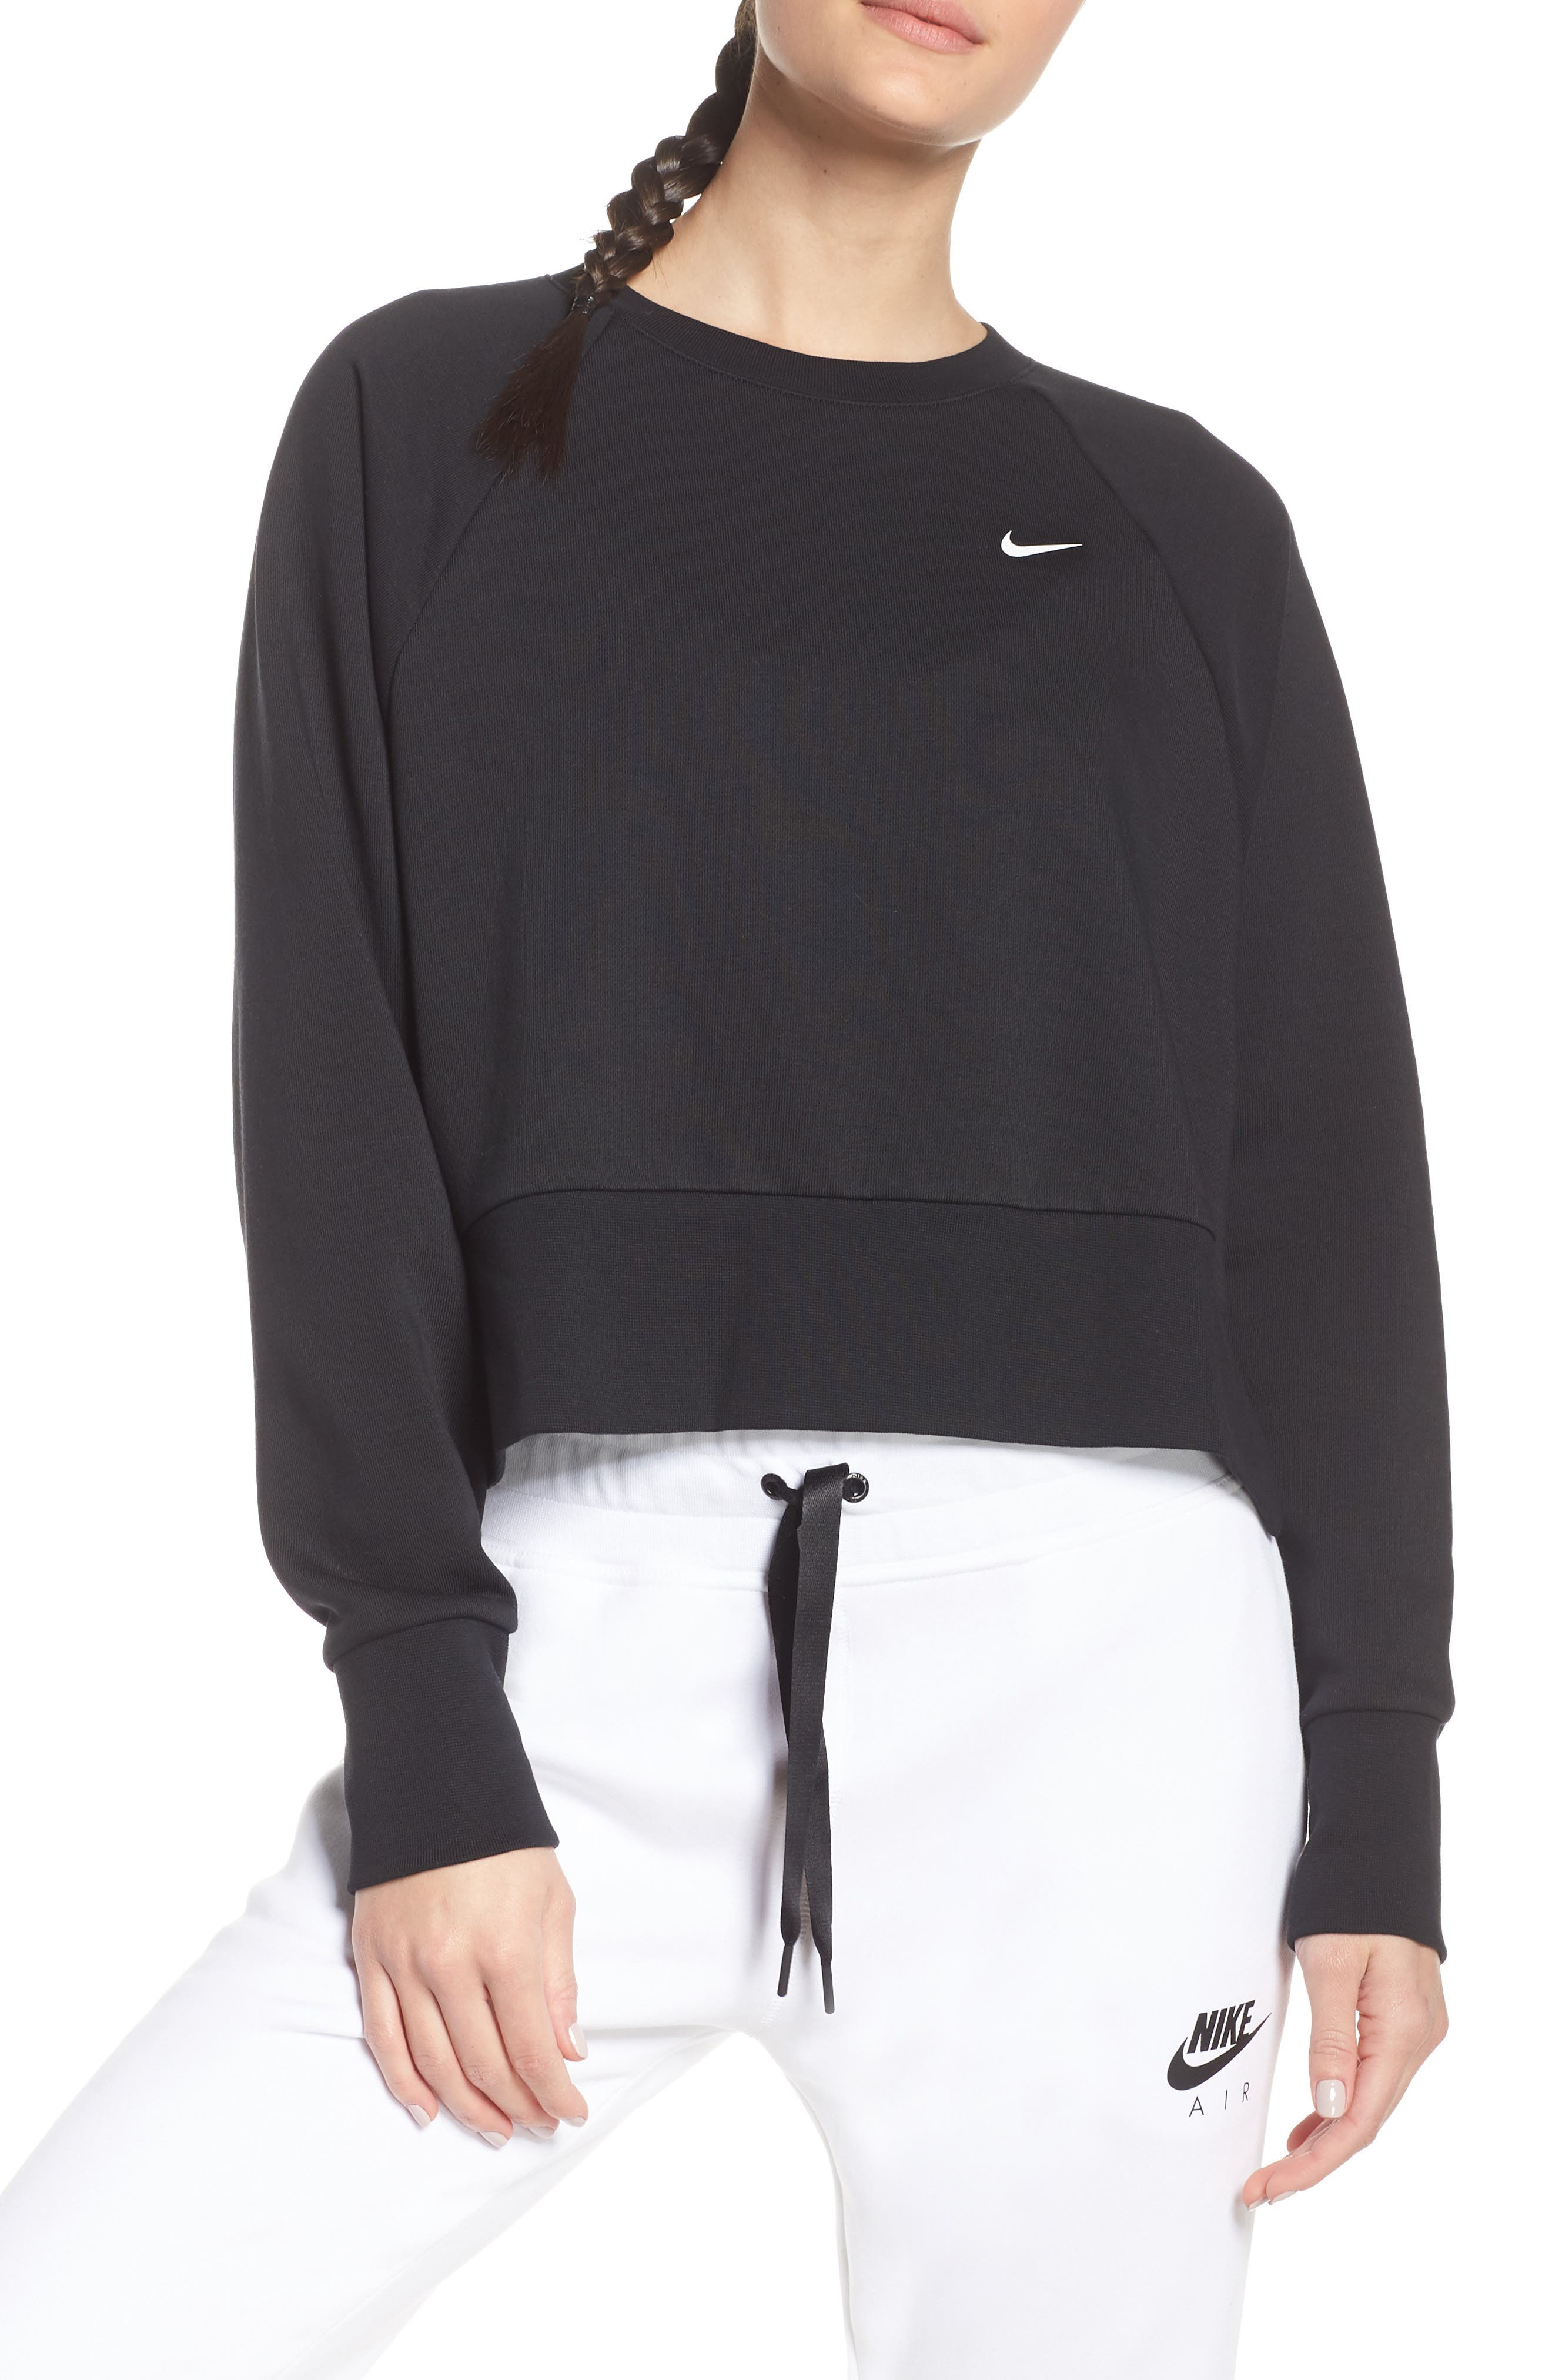 NIKE Dry Cropped Training Sweatshirt, Main, color, BLACK/ WHITE